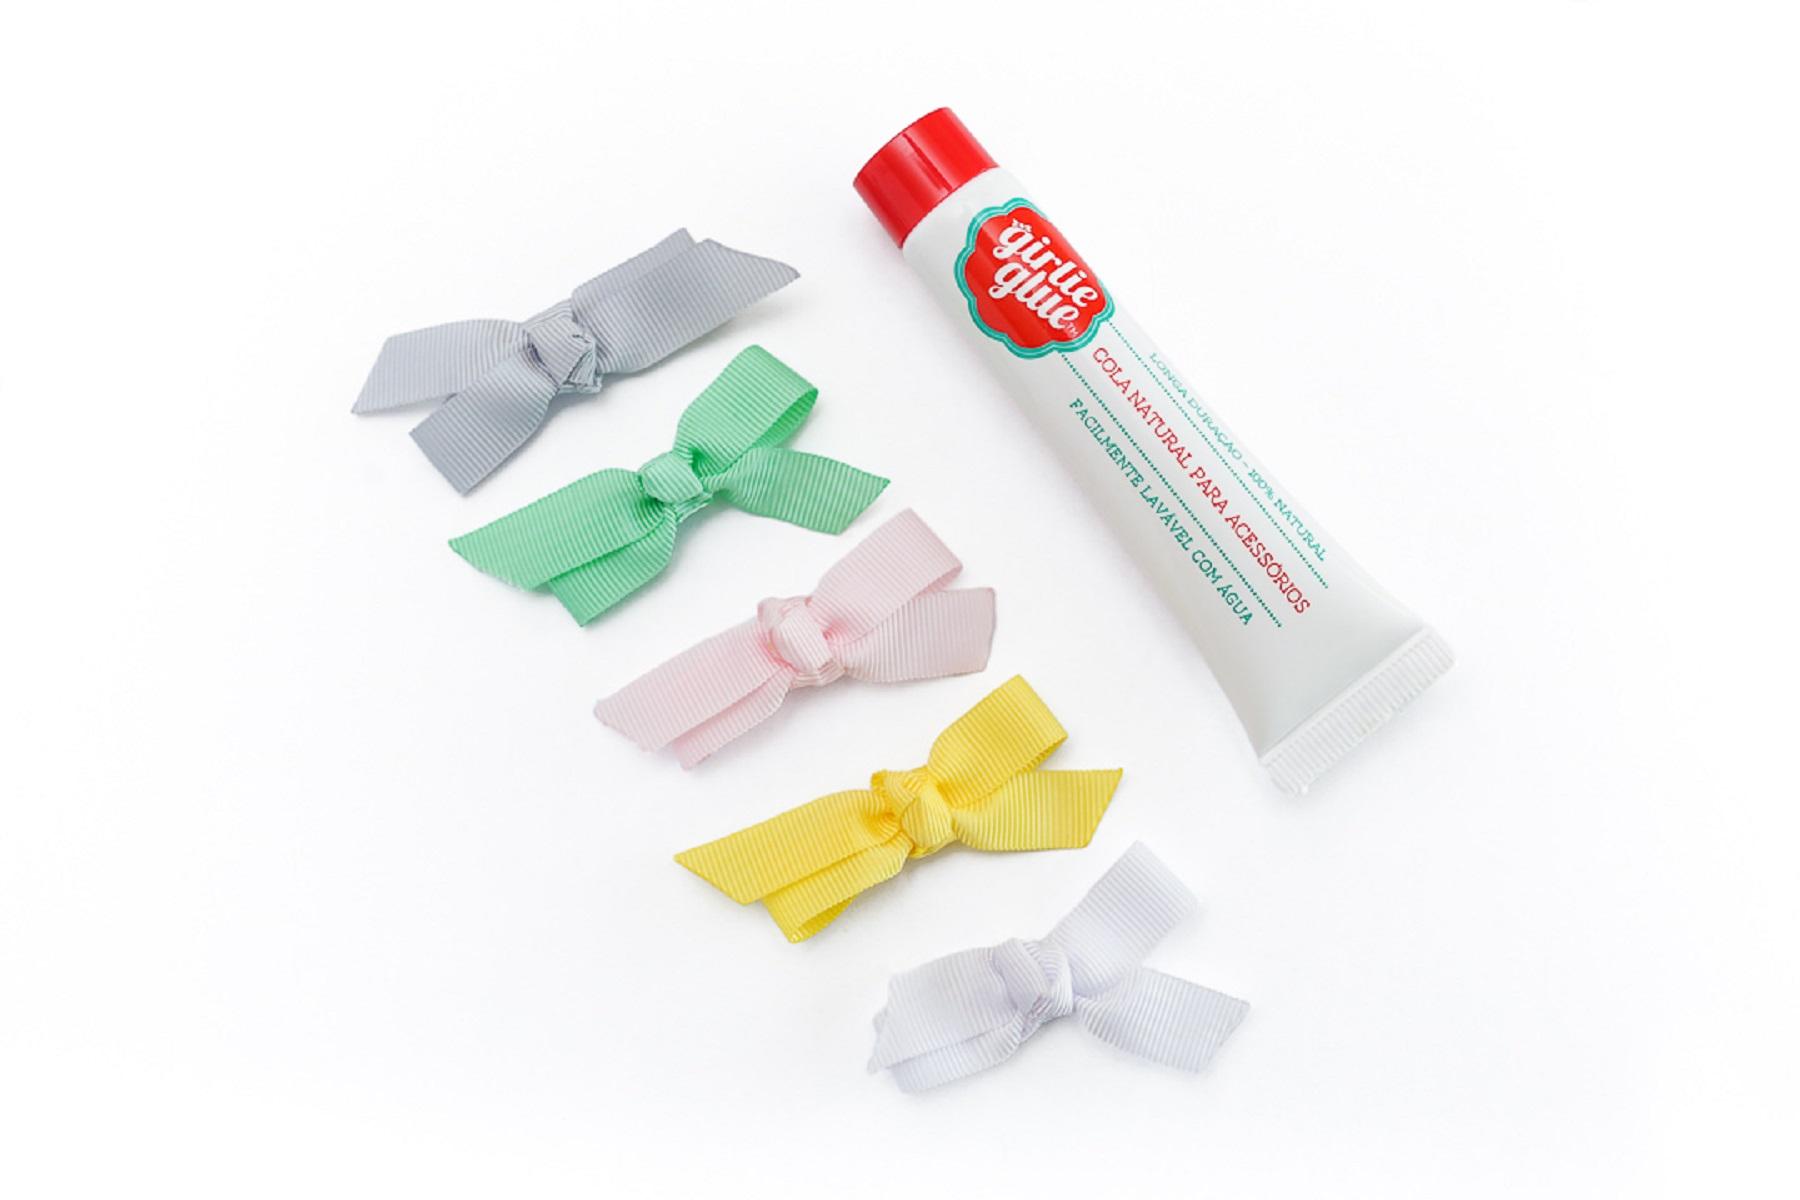 Girlie Glue + Laços Sortidos